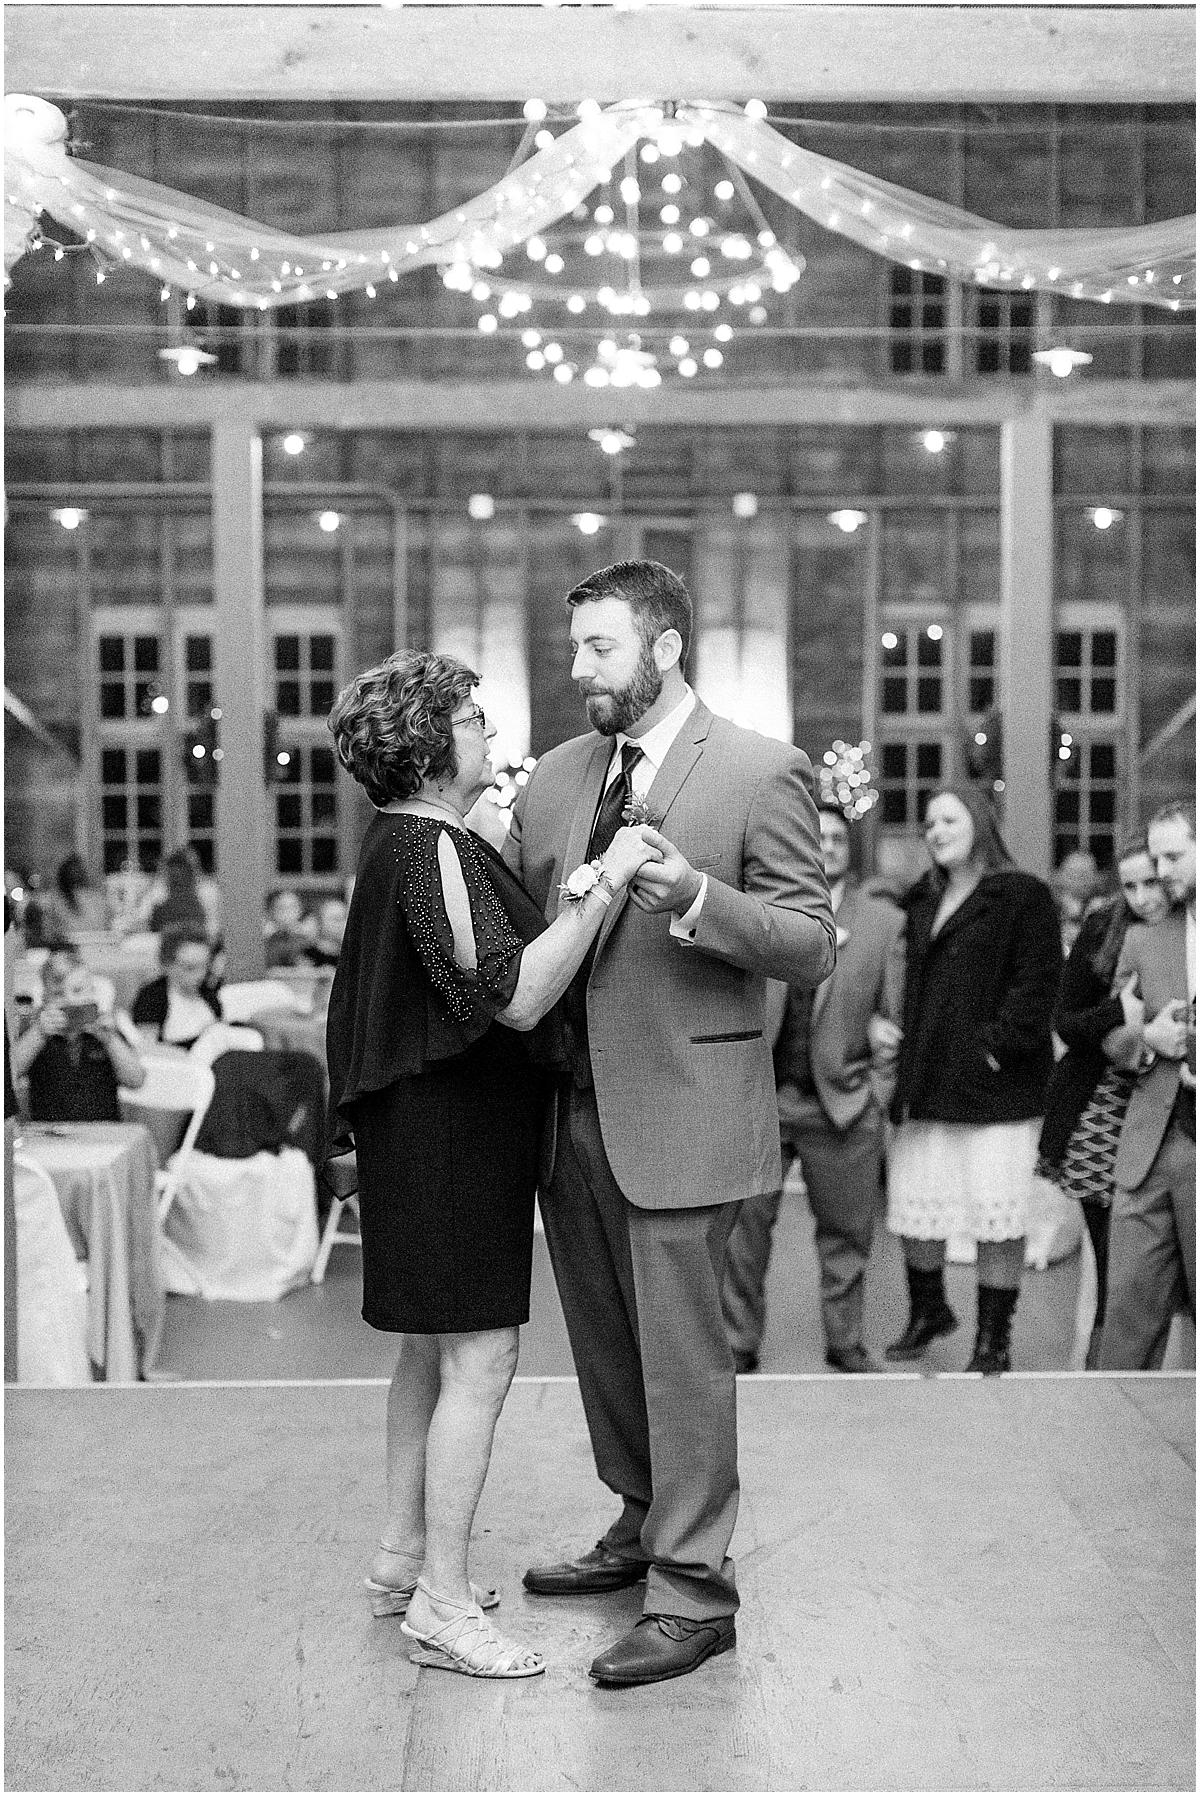 Chehalis Washington Winter Wedding Silver and White | Willapa Hills Farm Wedding | Eastham | Emma Rose Company PNW Light and Airy Wedding Photographer_0054.jpg